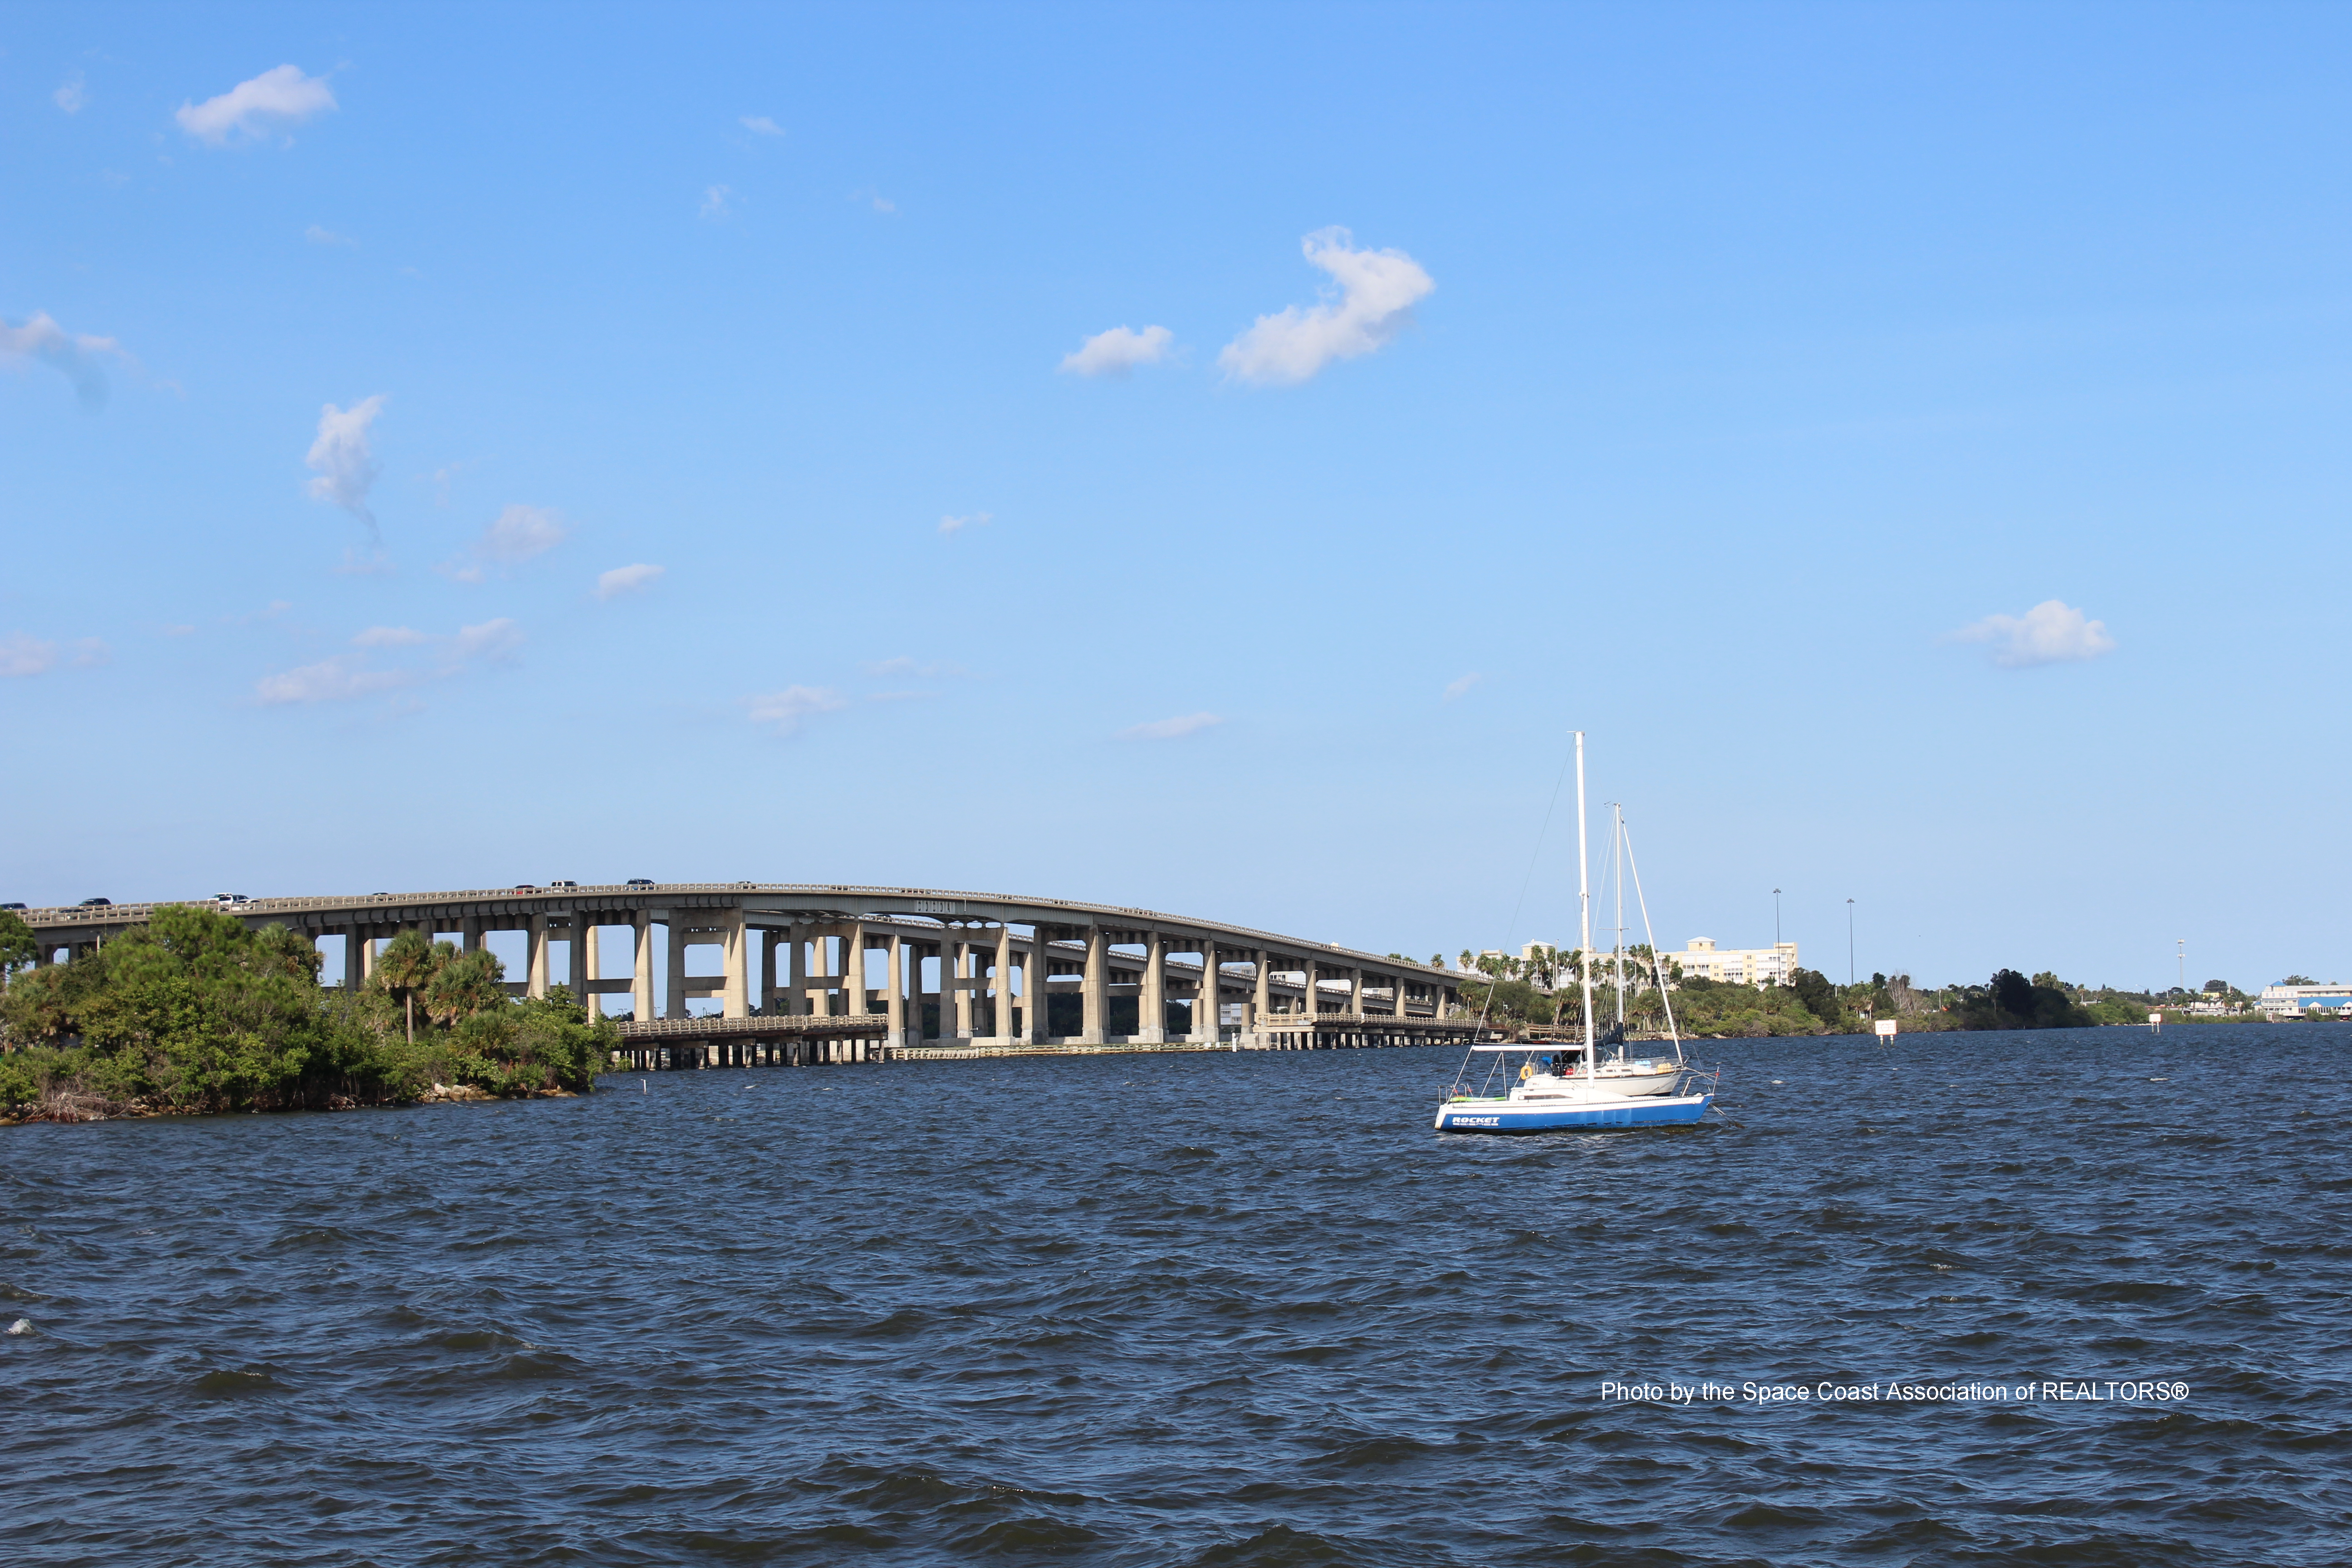 Cocoa Village, Florida overpass